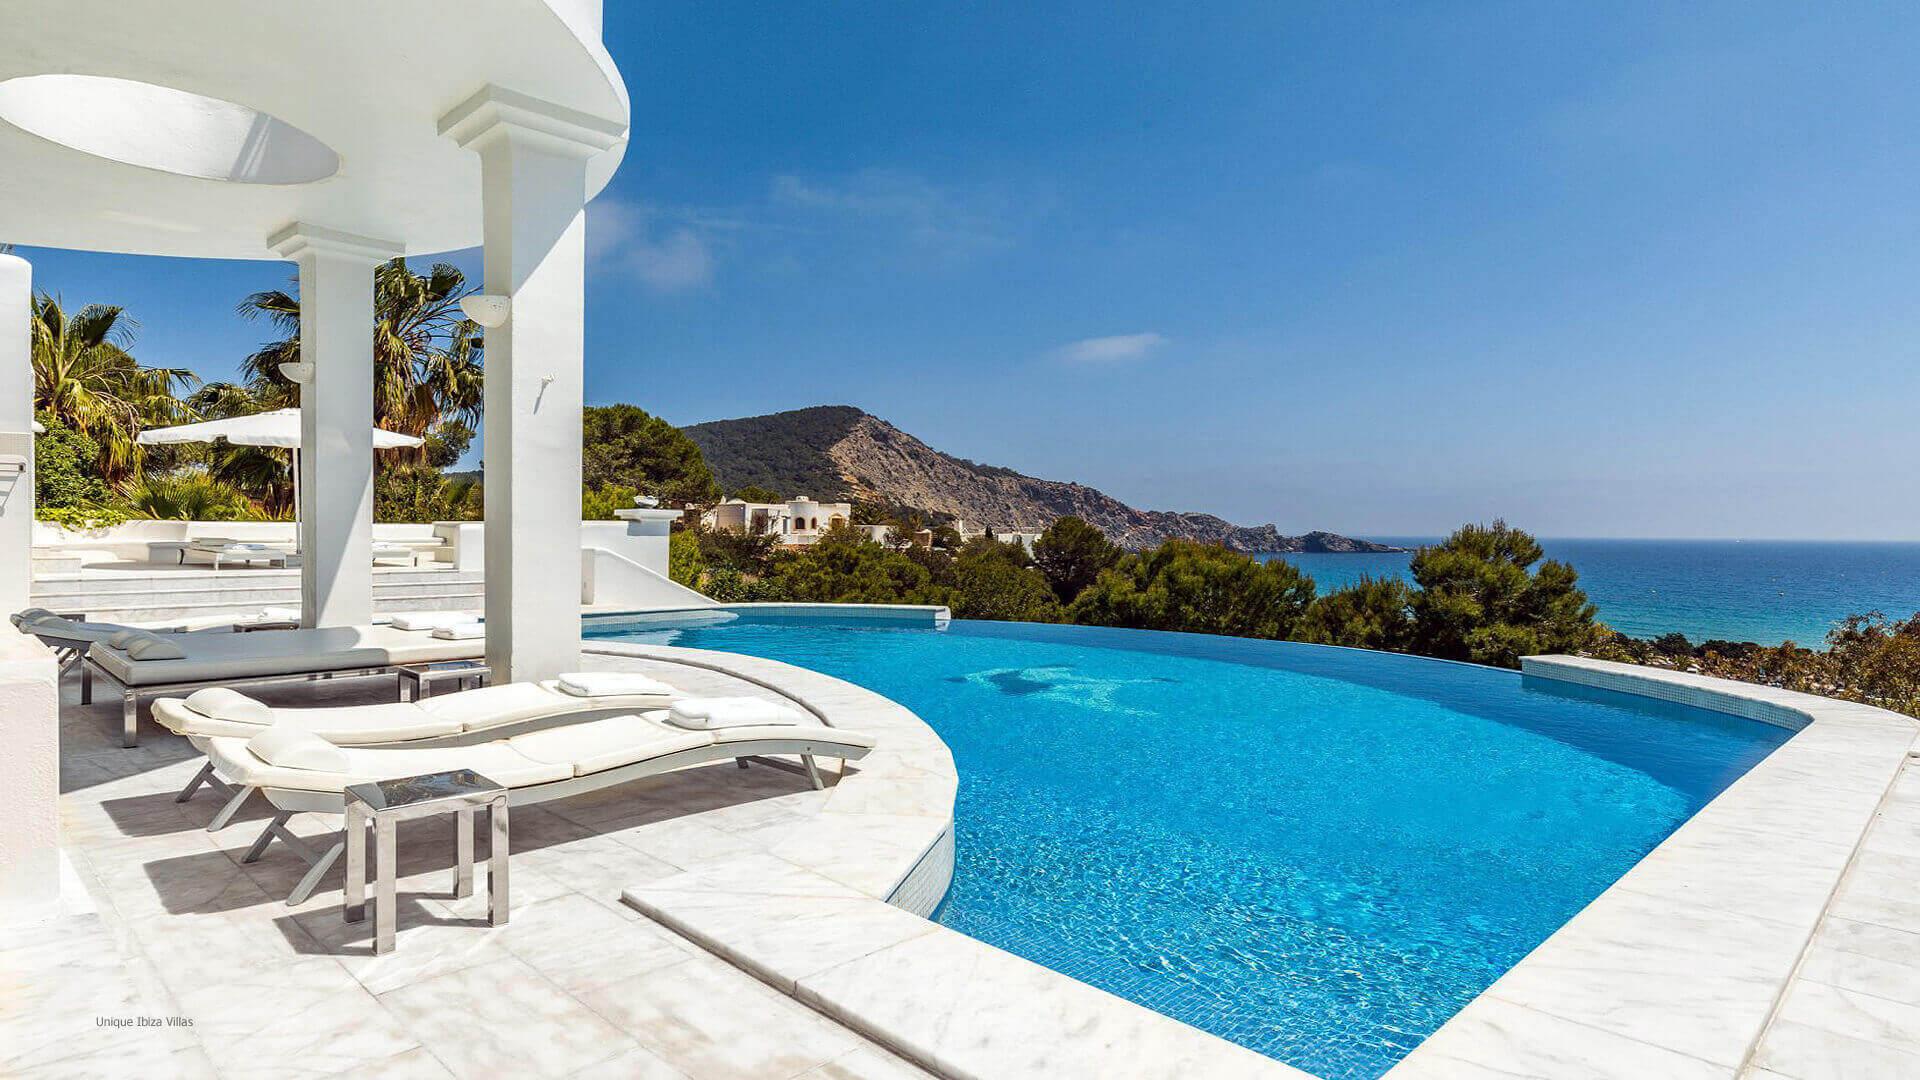 Villa Rica Ibiza 8 Cala Jondal